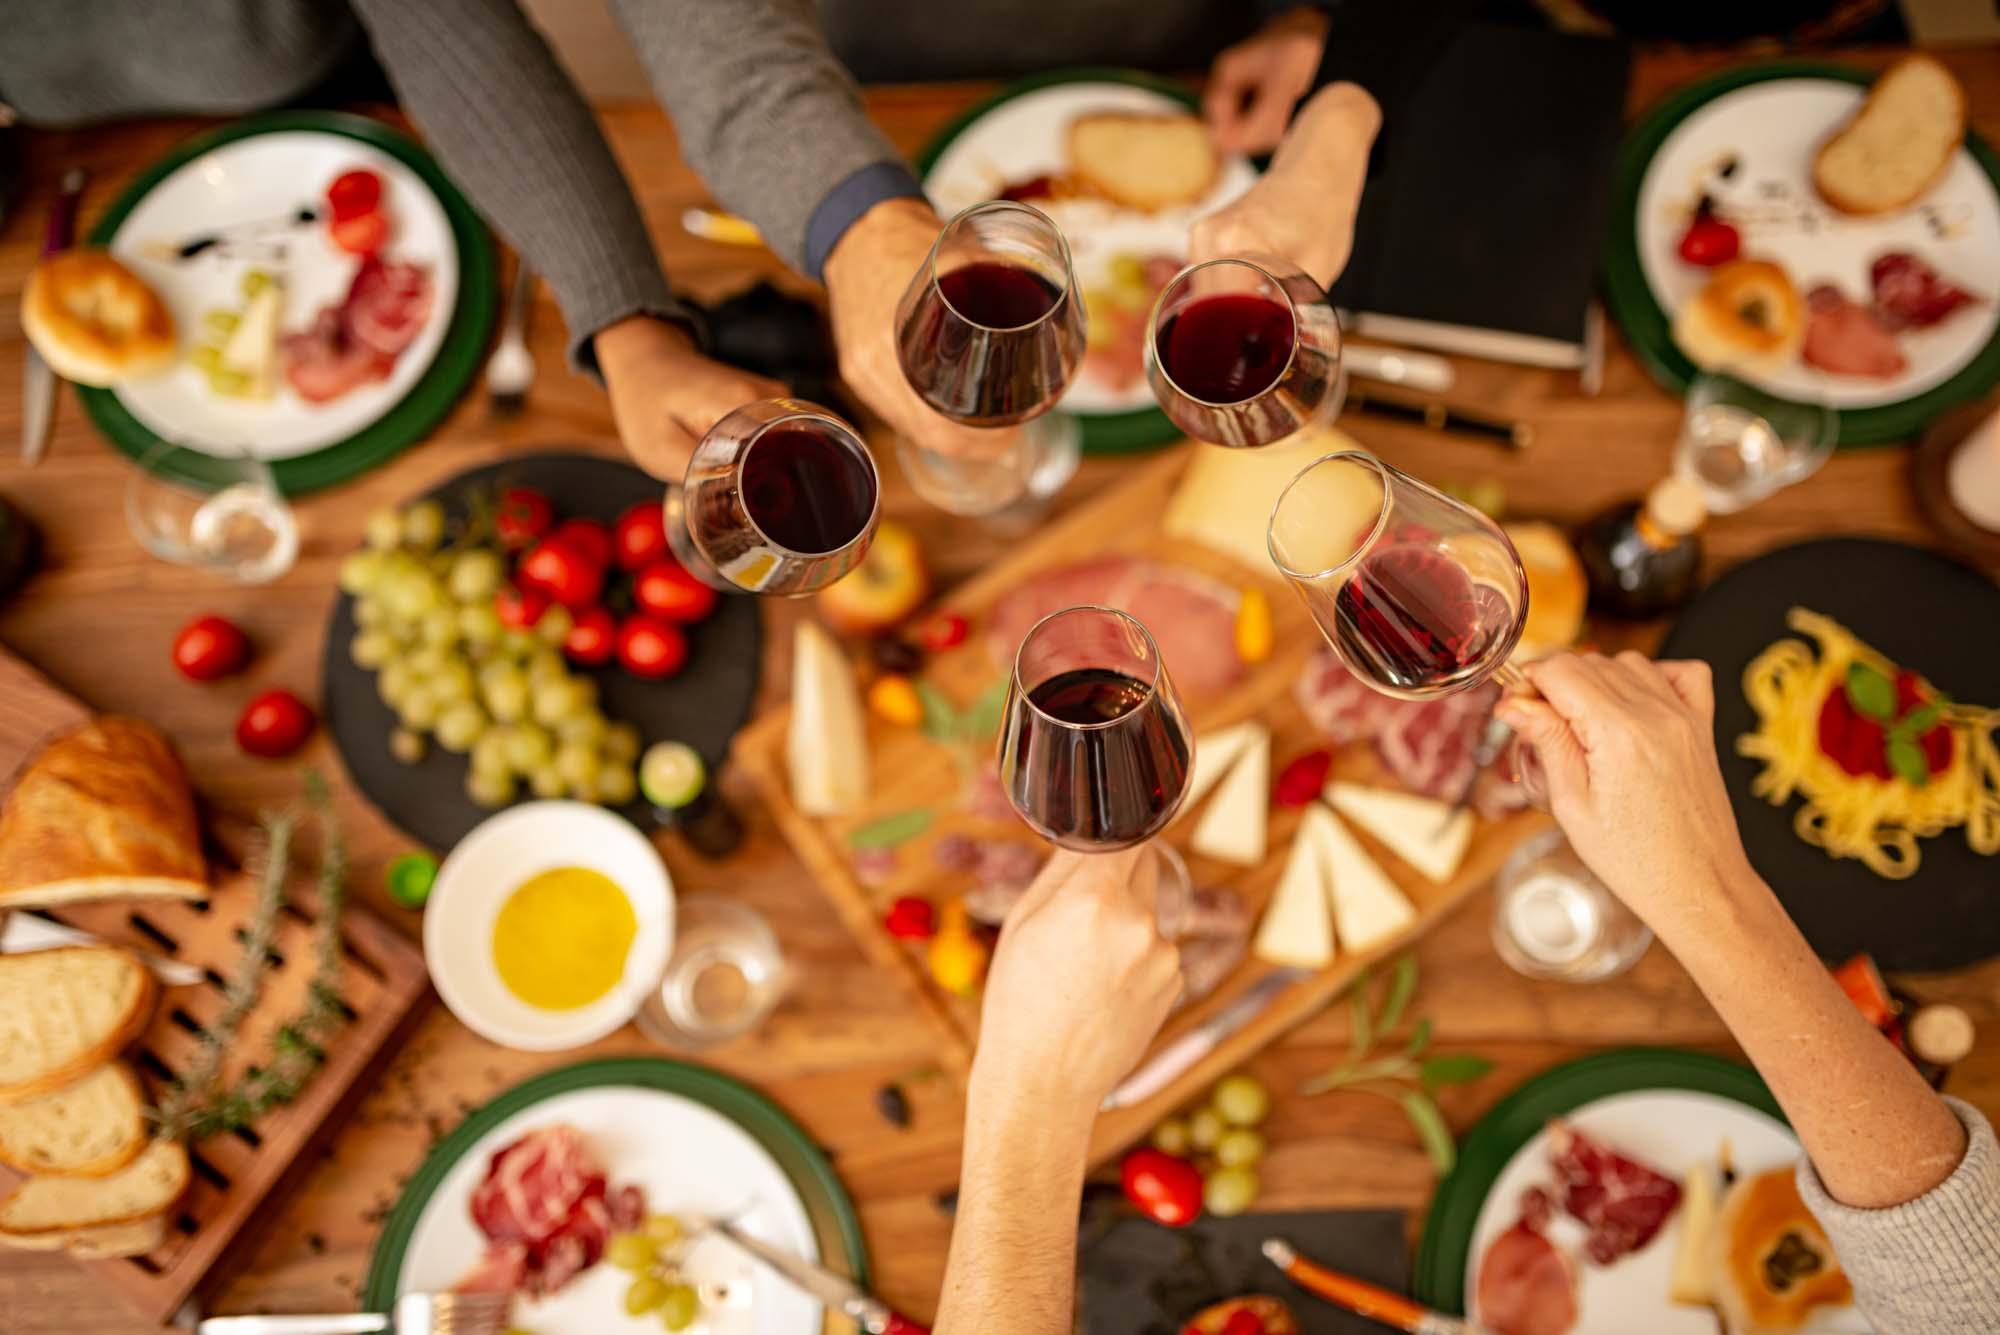 Corsi Di Cucina Formazione Manageriale a Modena